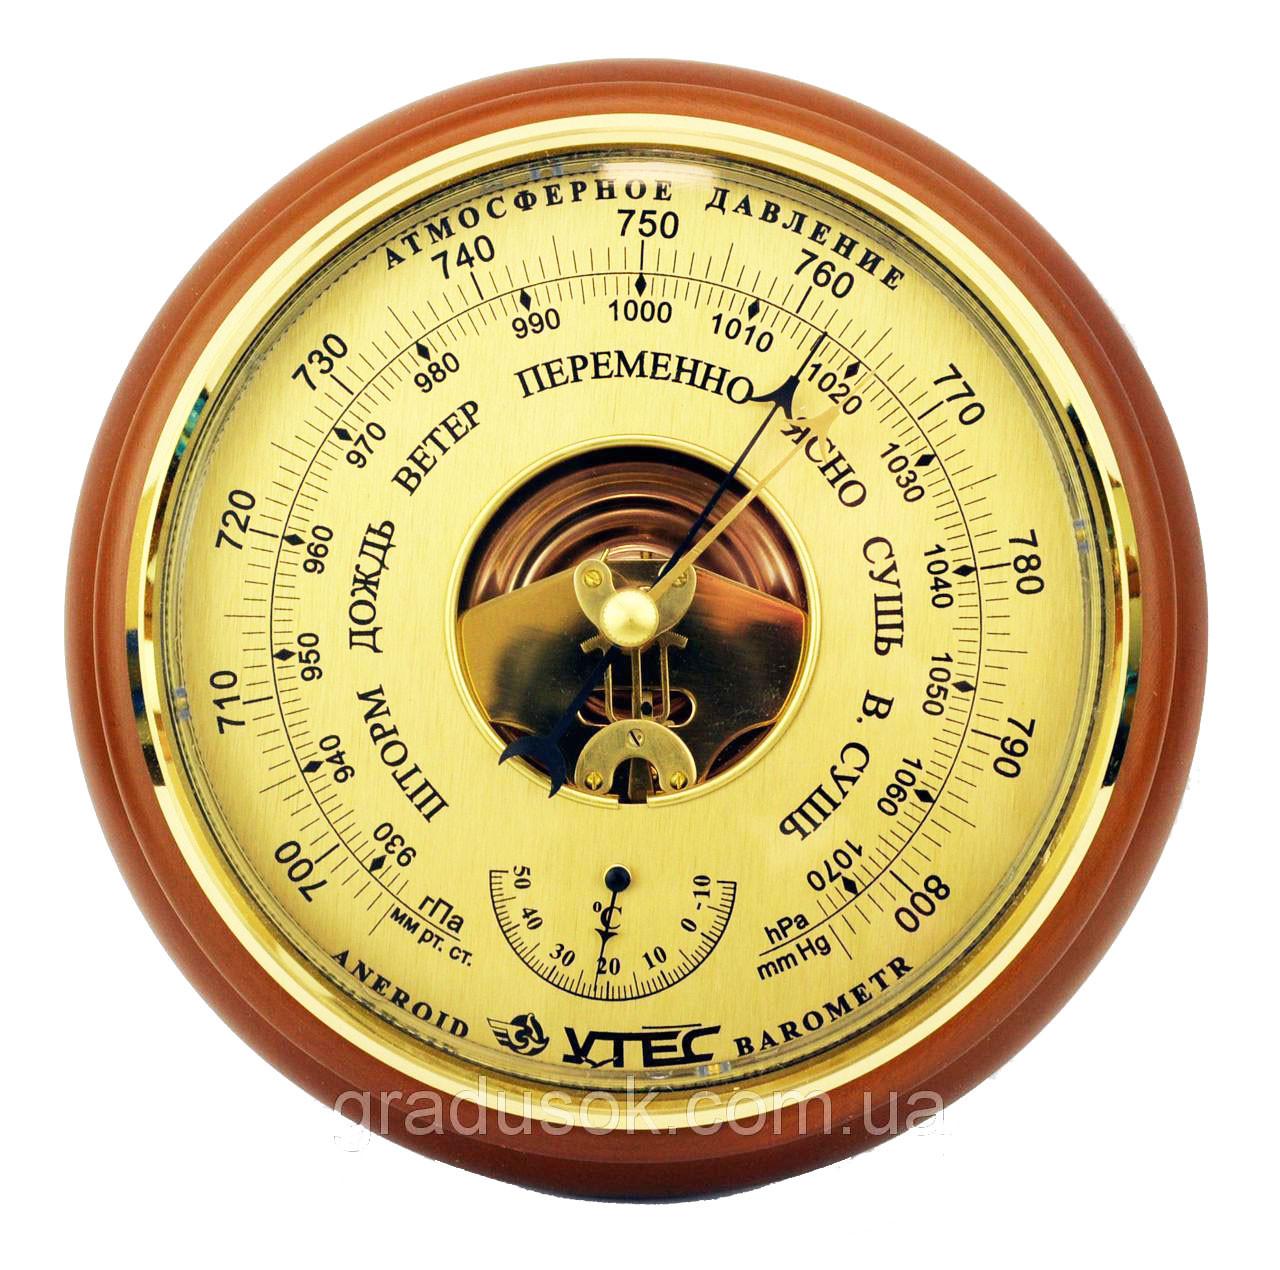 Барометр анероид «Утес/Крэт» БТК СН 8 с термометром, большой (⌀175мм), фото 1